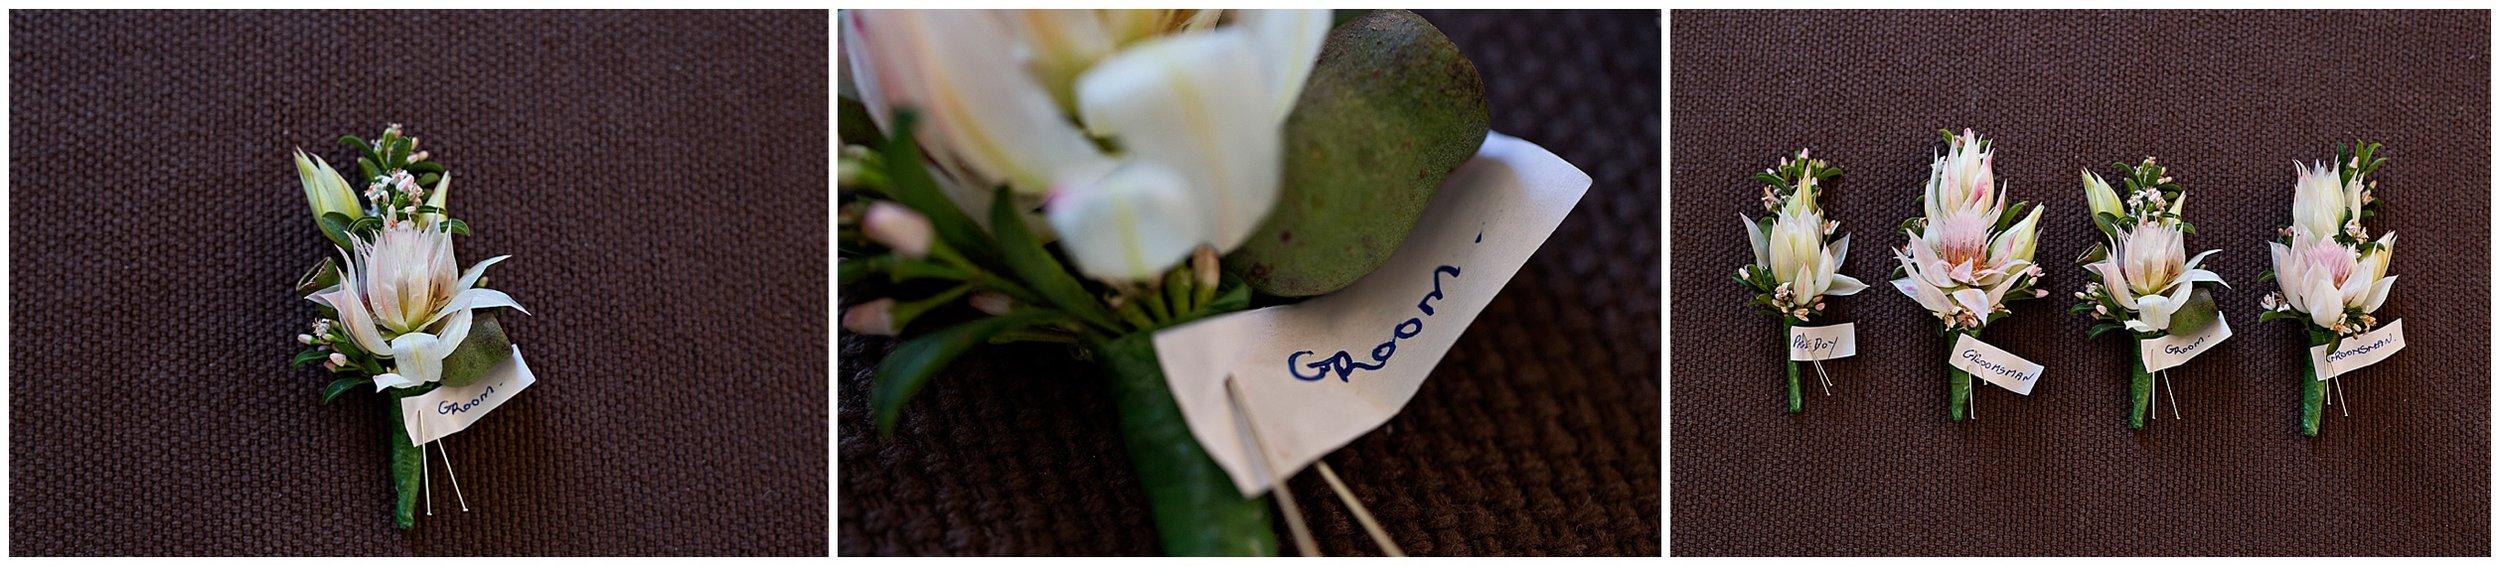 shepparton-wedding-photographer_0002.jpg